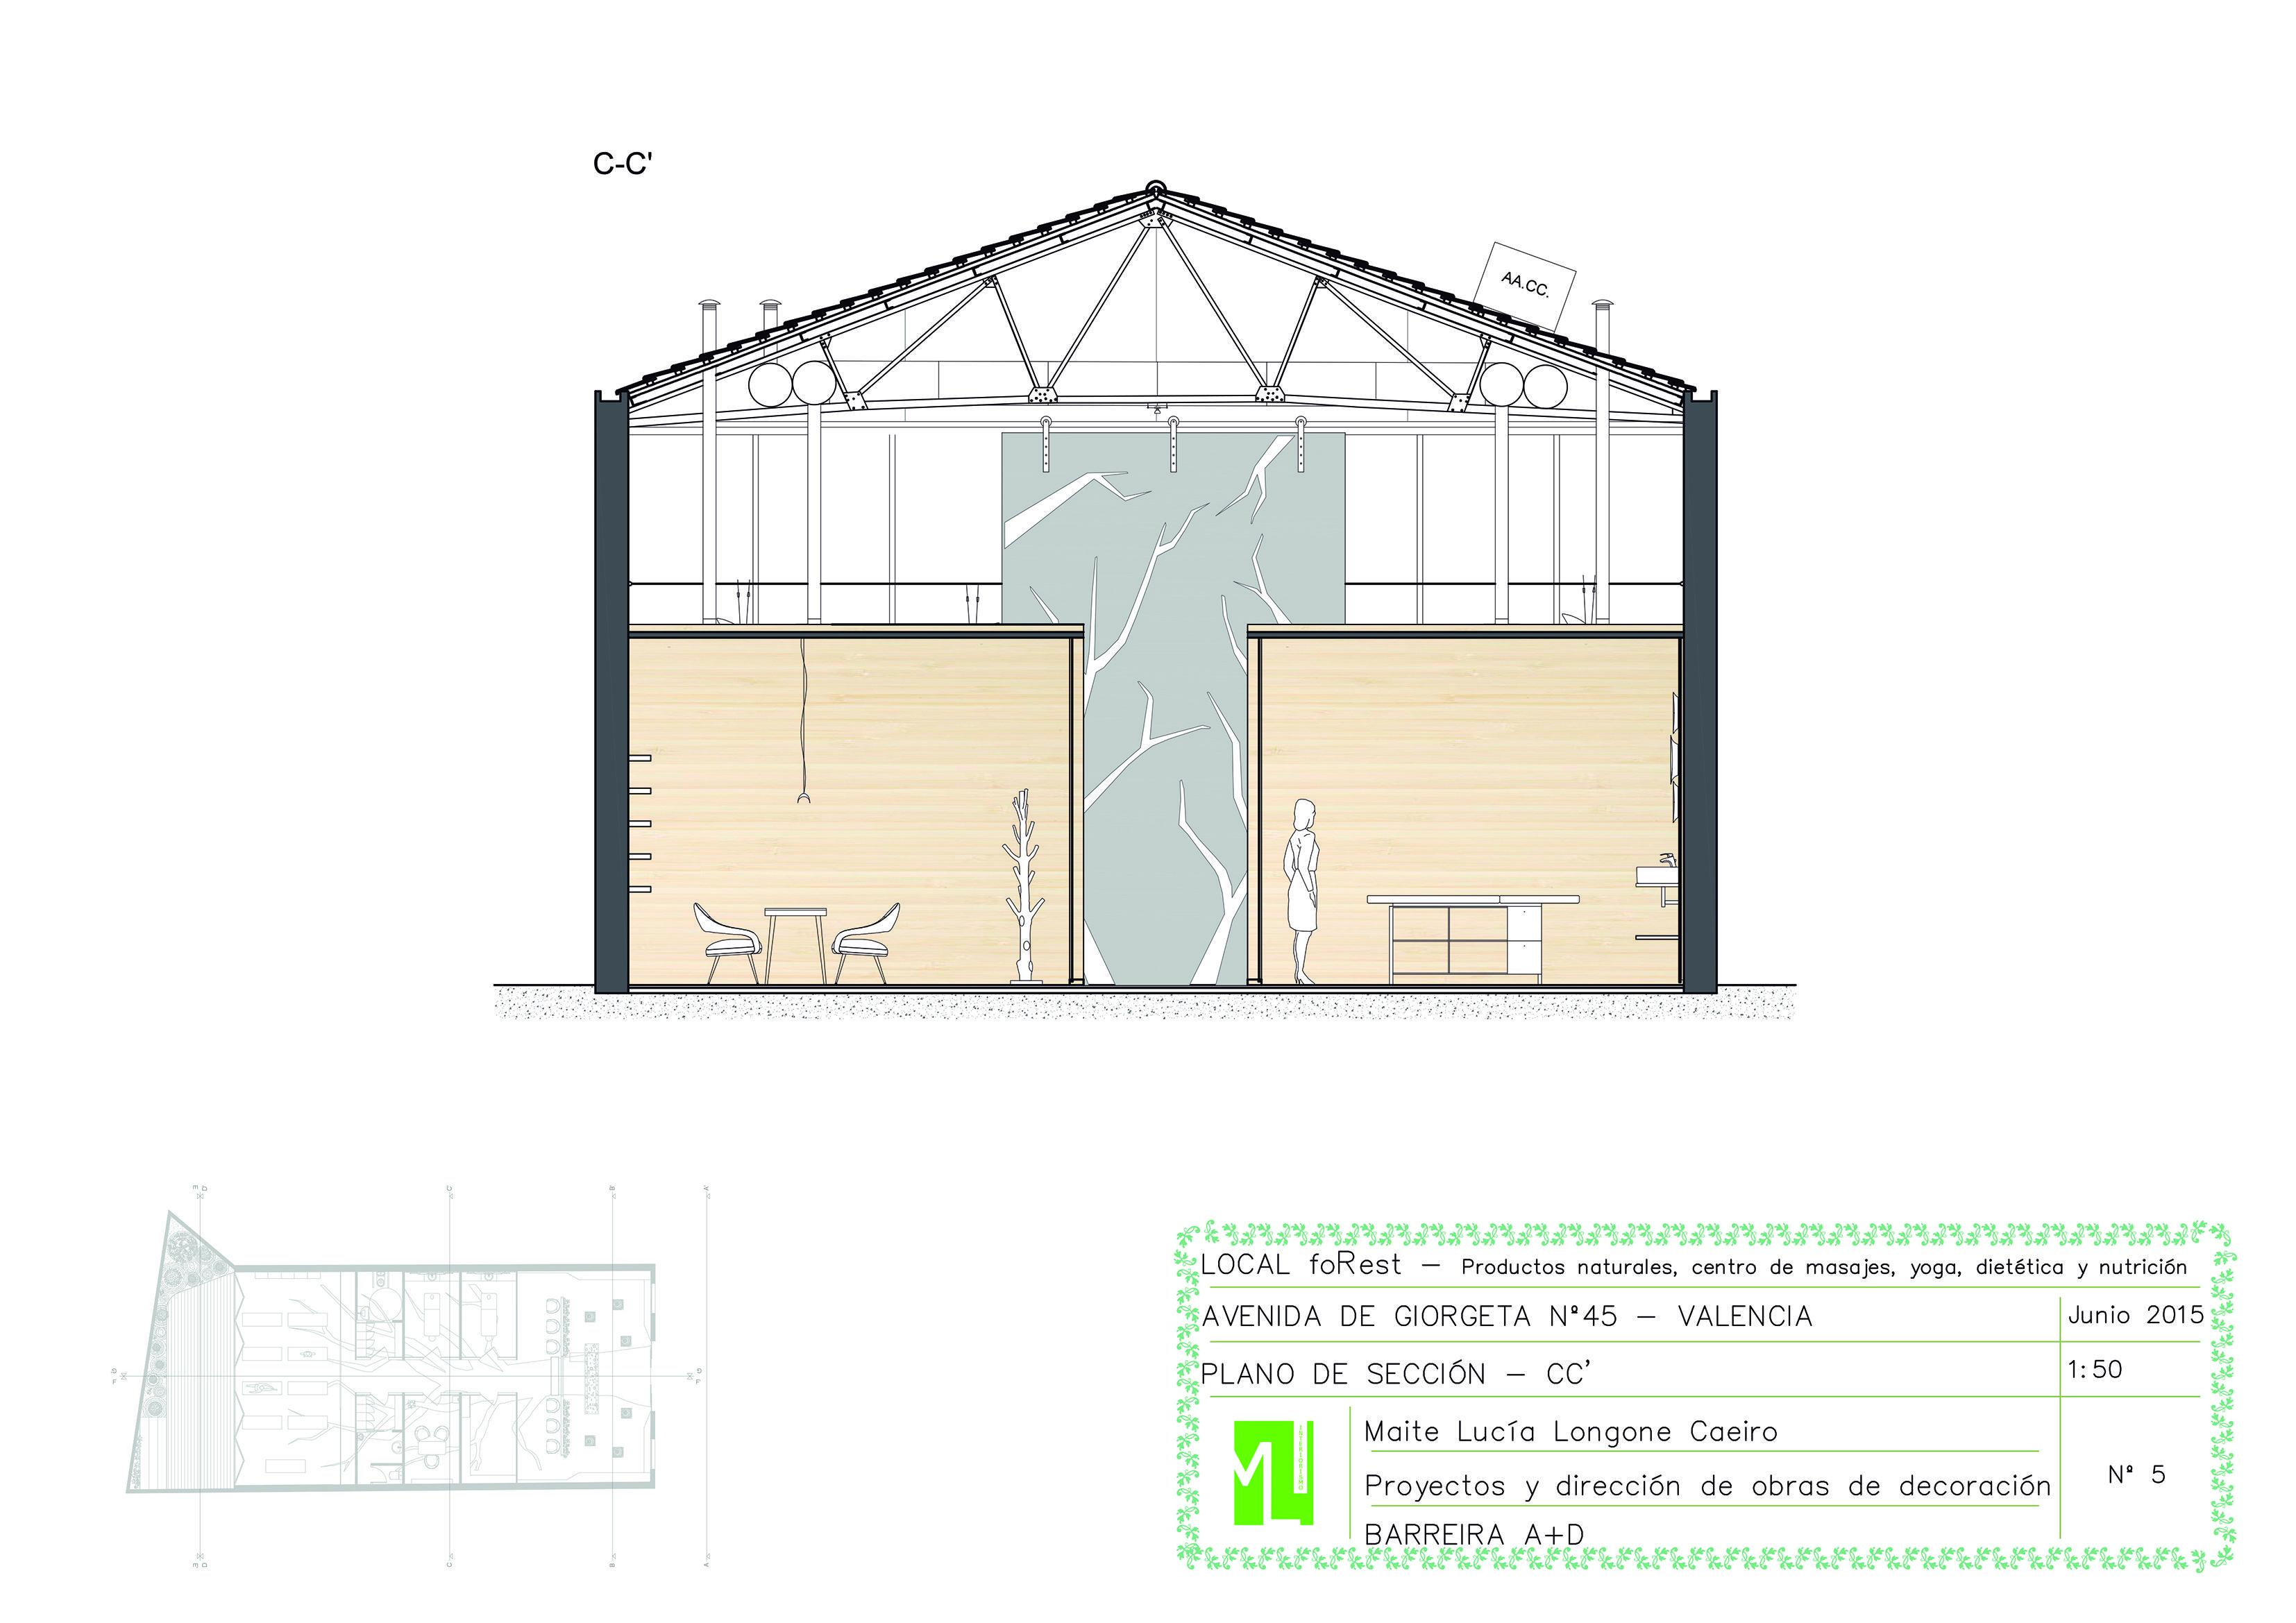 Alumna lucia longone maite asignatura proyecto ii curso for Ciclo superior diseno de interiores